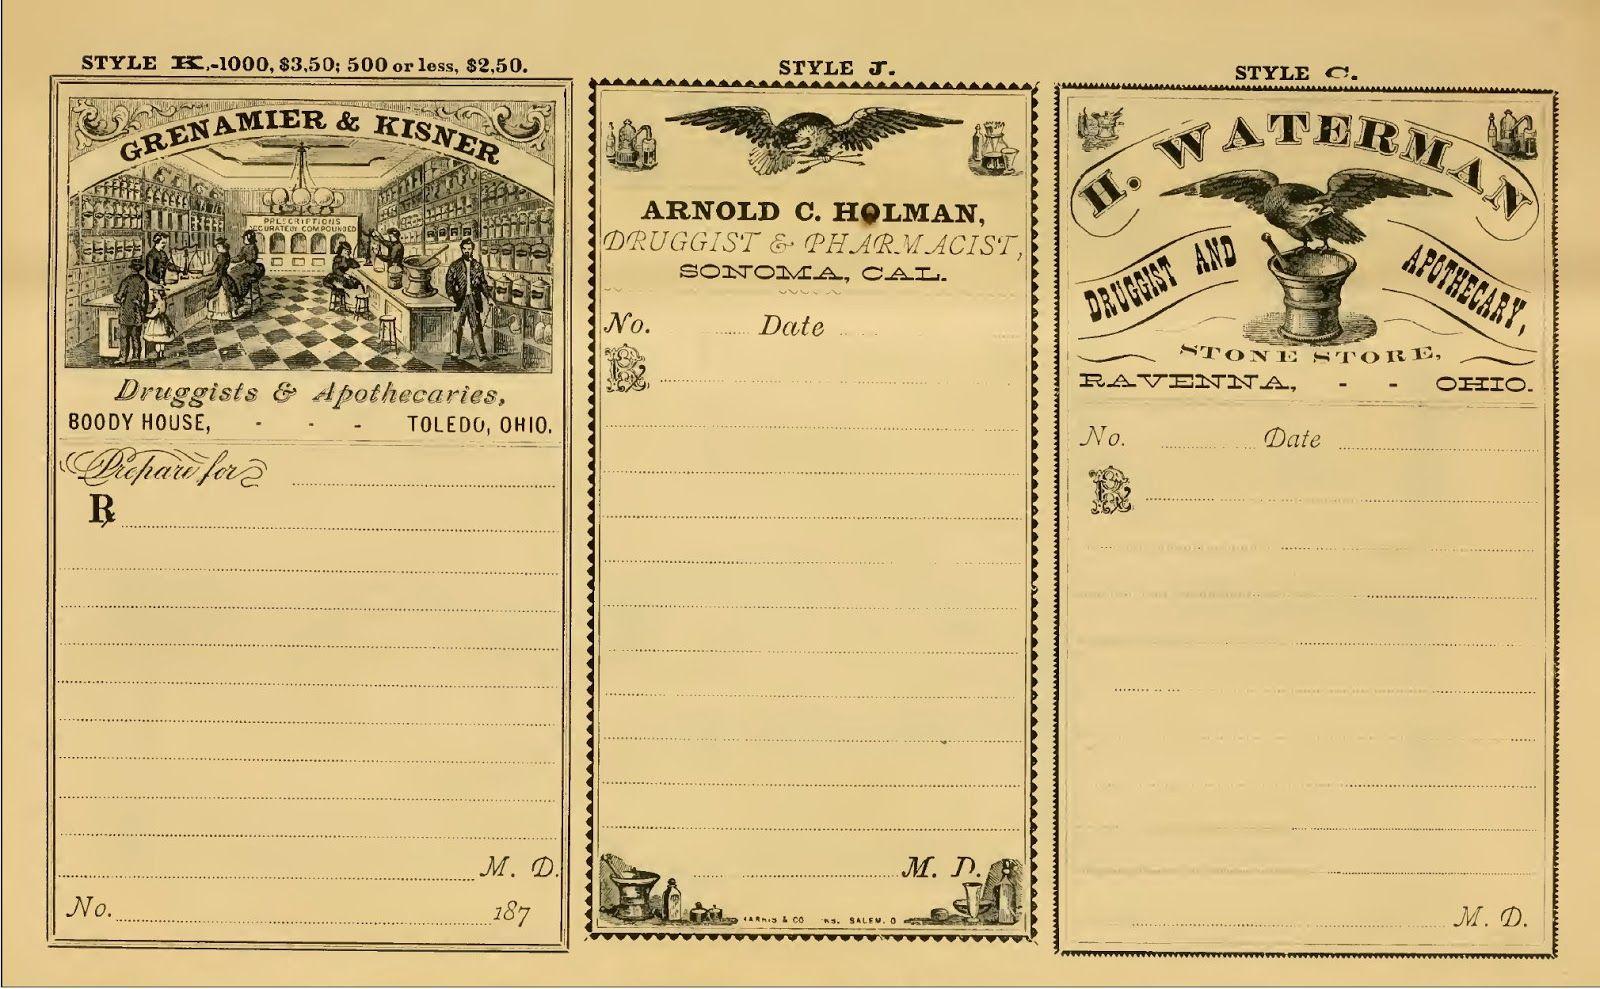 Creative digi vintage: FREE VINTAGE PHARMACY LABELS | to print